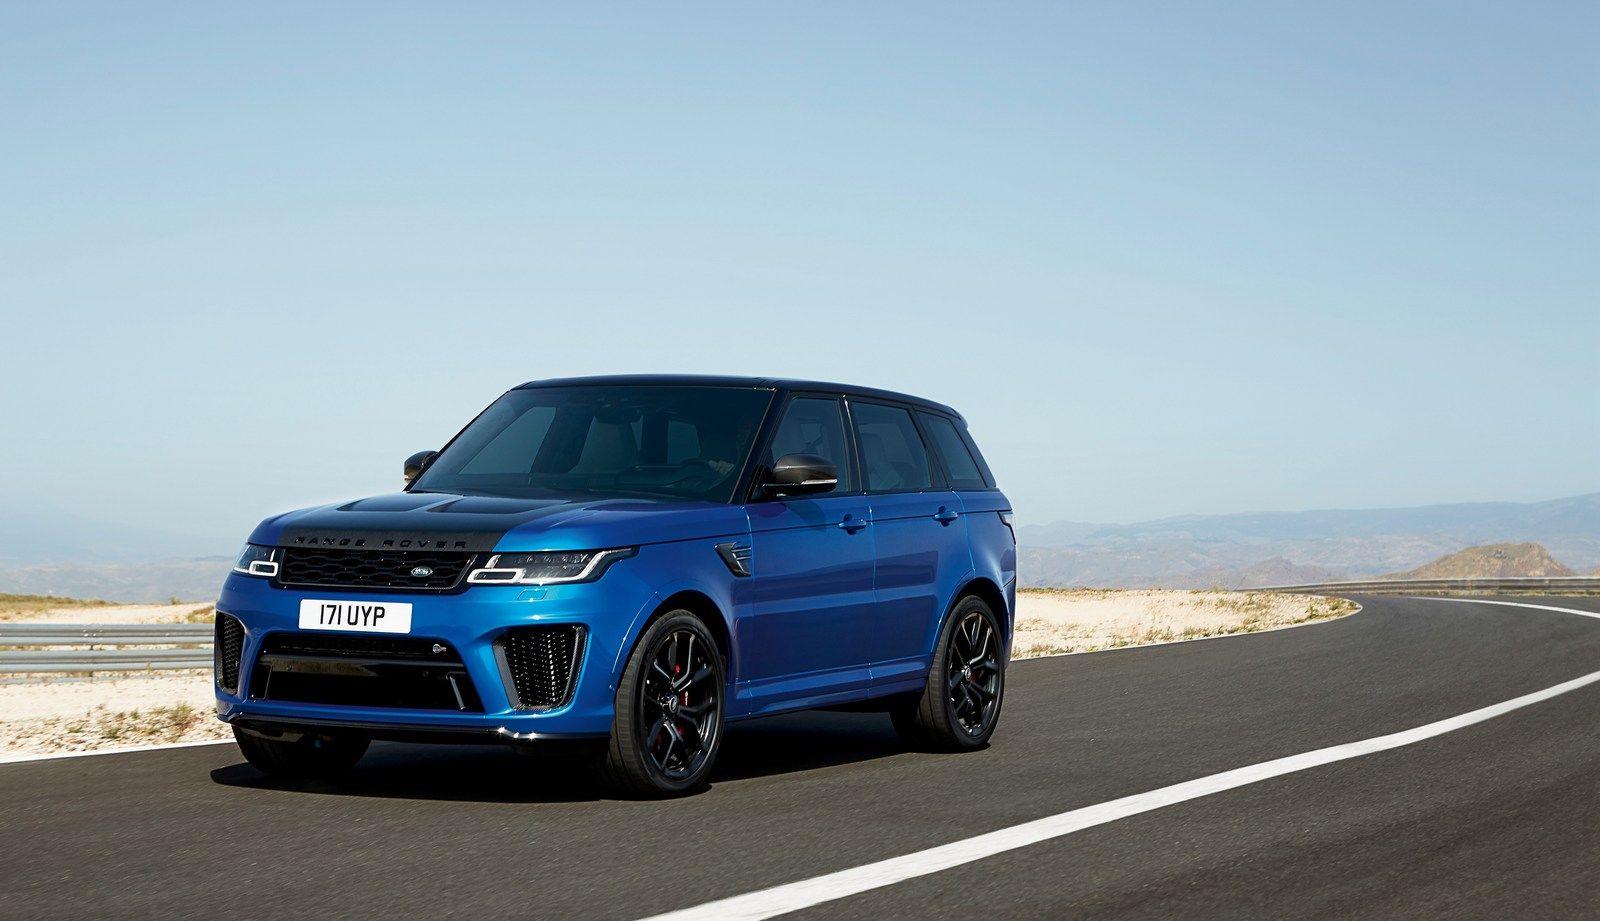 2018 Range Rover Sport Svr Facelift Looks Ready To Rumble Carscoops Range Rover Sport Range Rover Land Rover